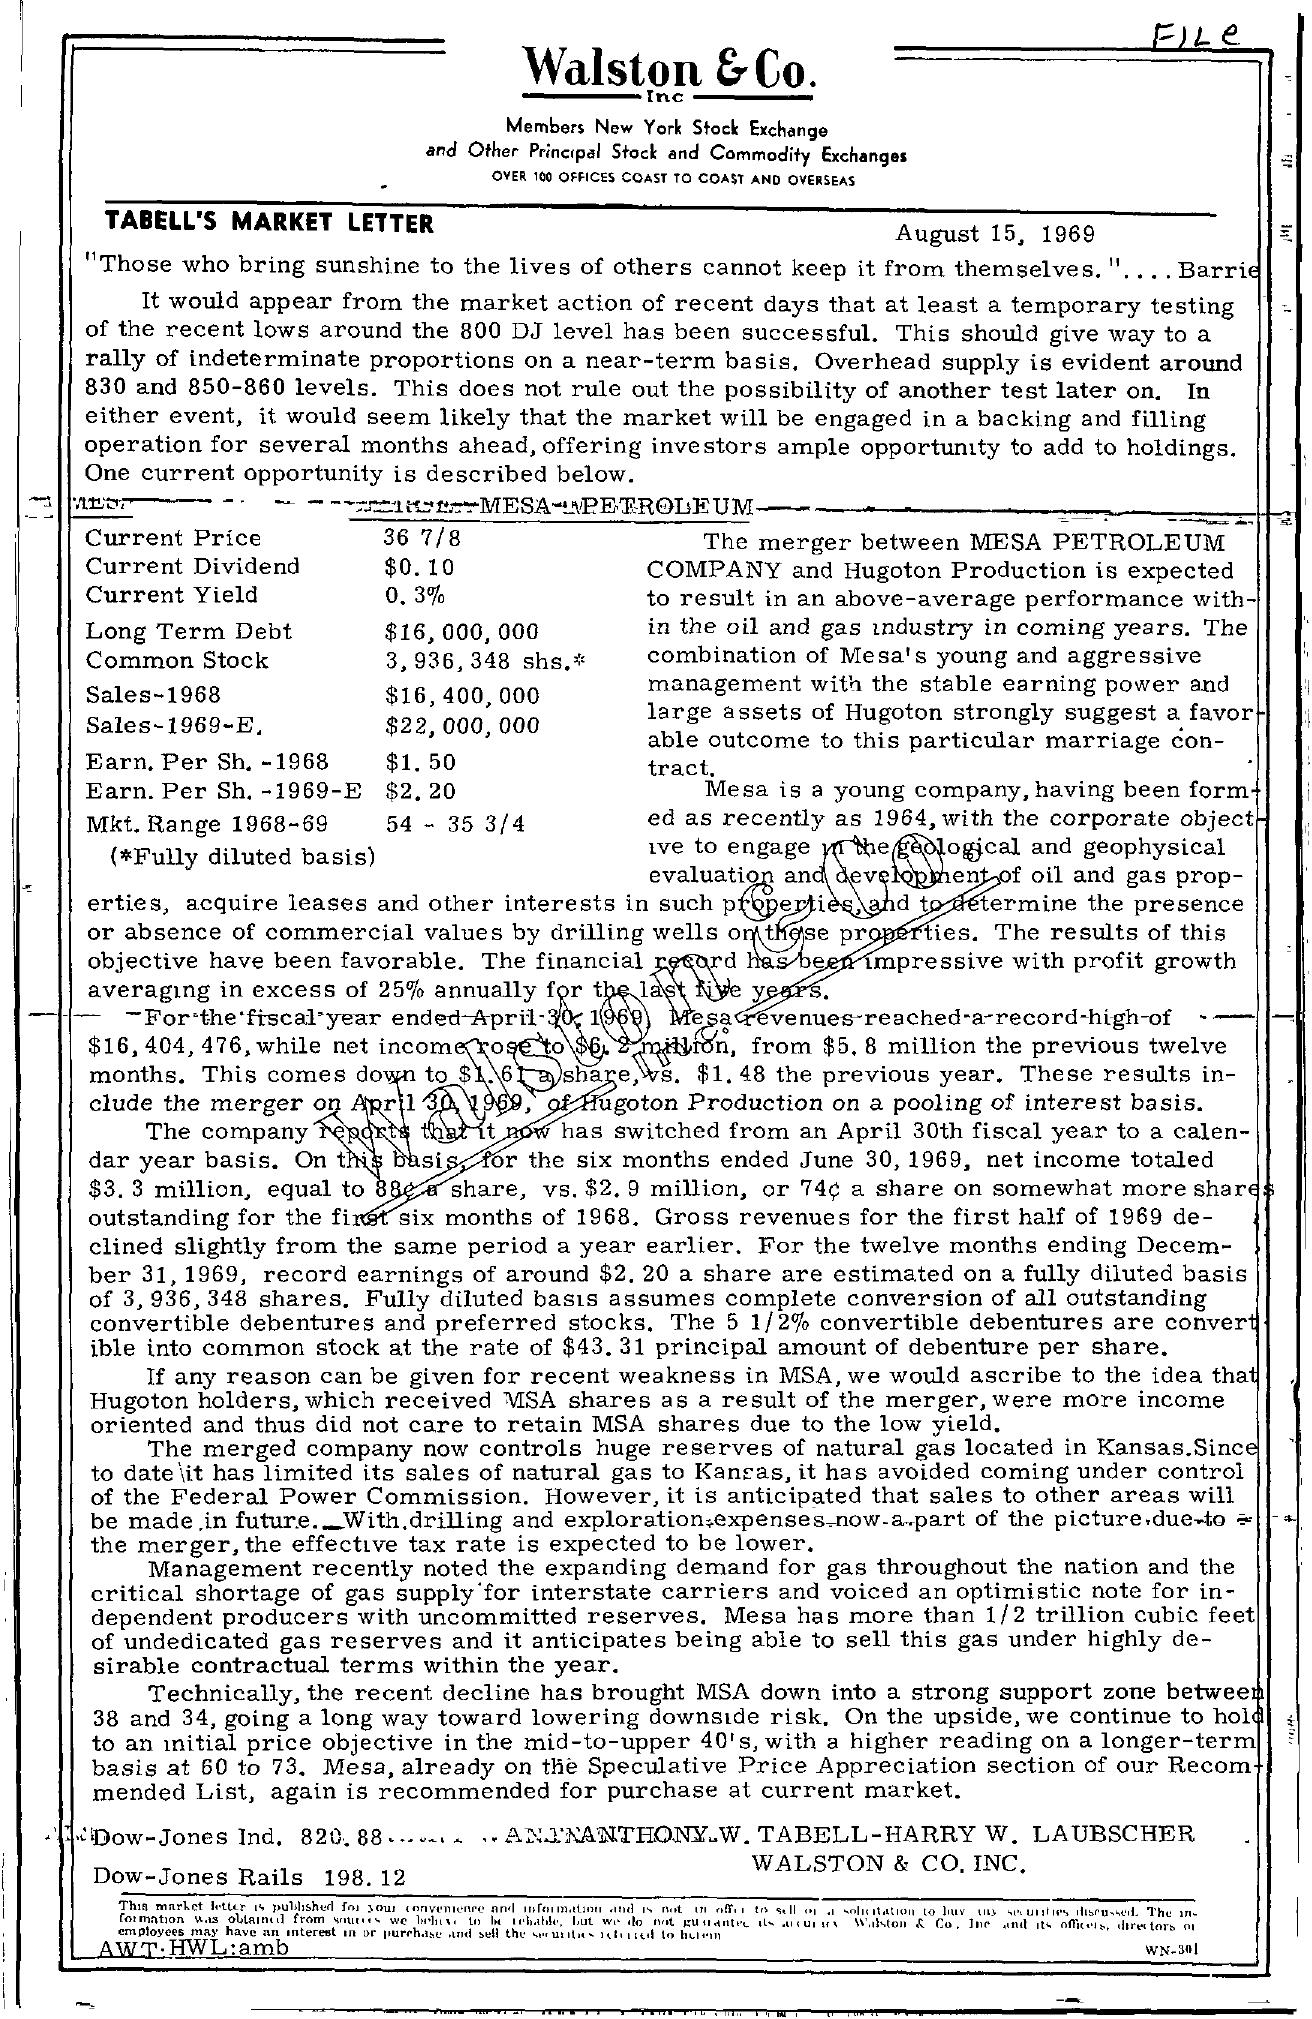 Tabell's Market Letter - August 15, 1969